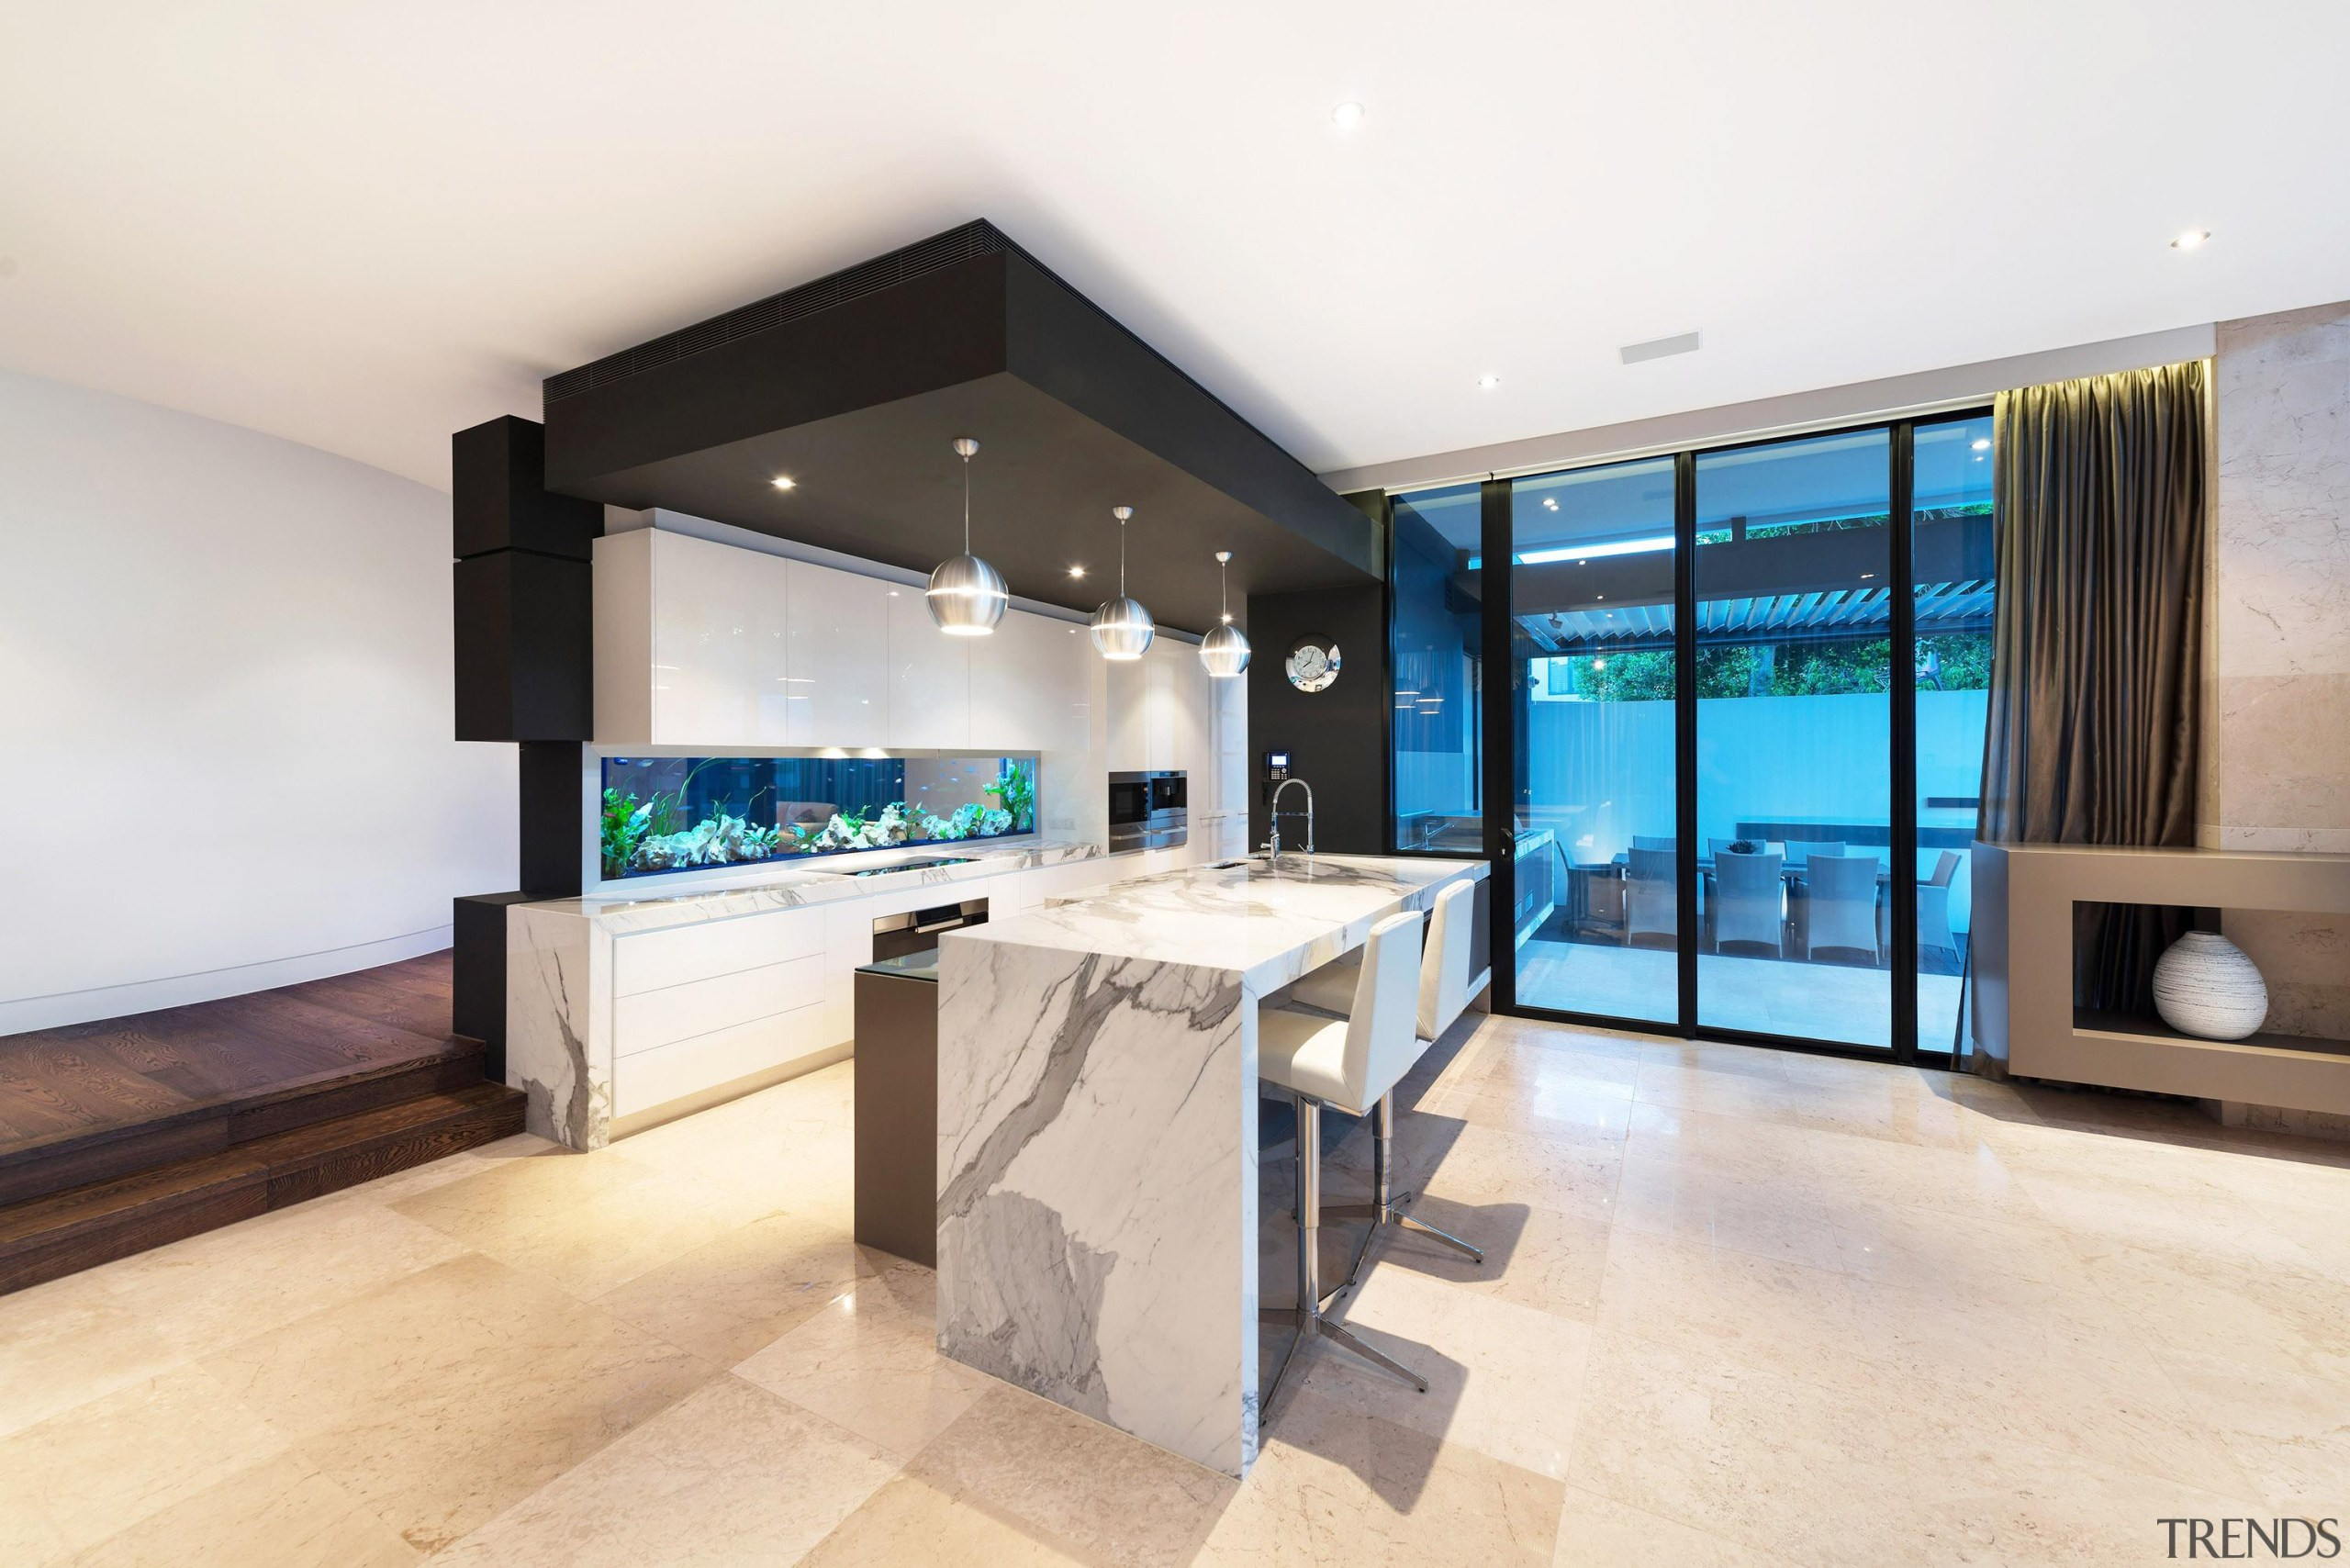 Winner Kitchen of the Year 2013 Victoria - estate, interior design, kitchen, living room, property, real estate, white